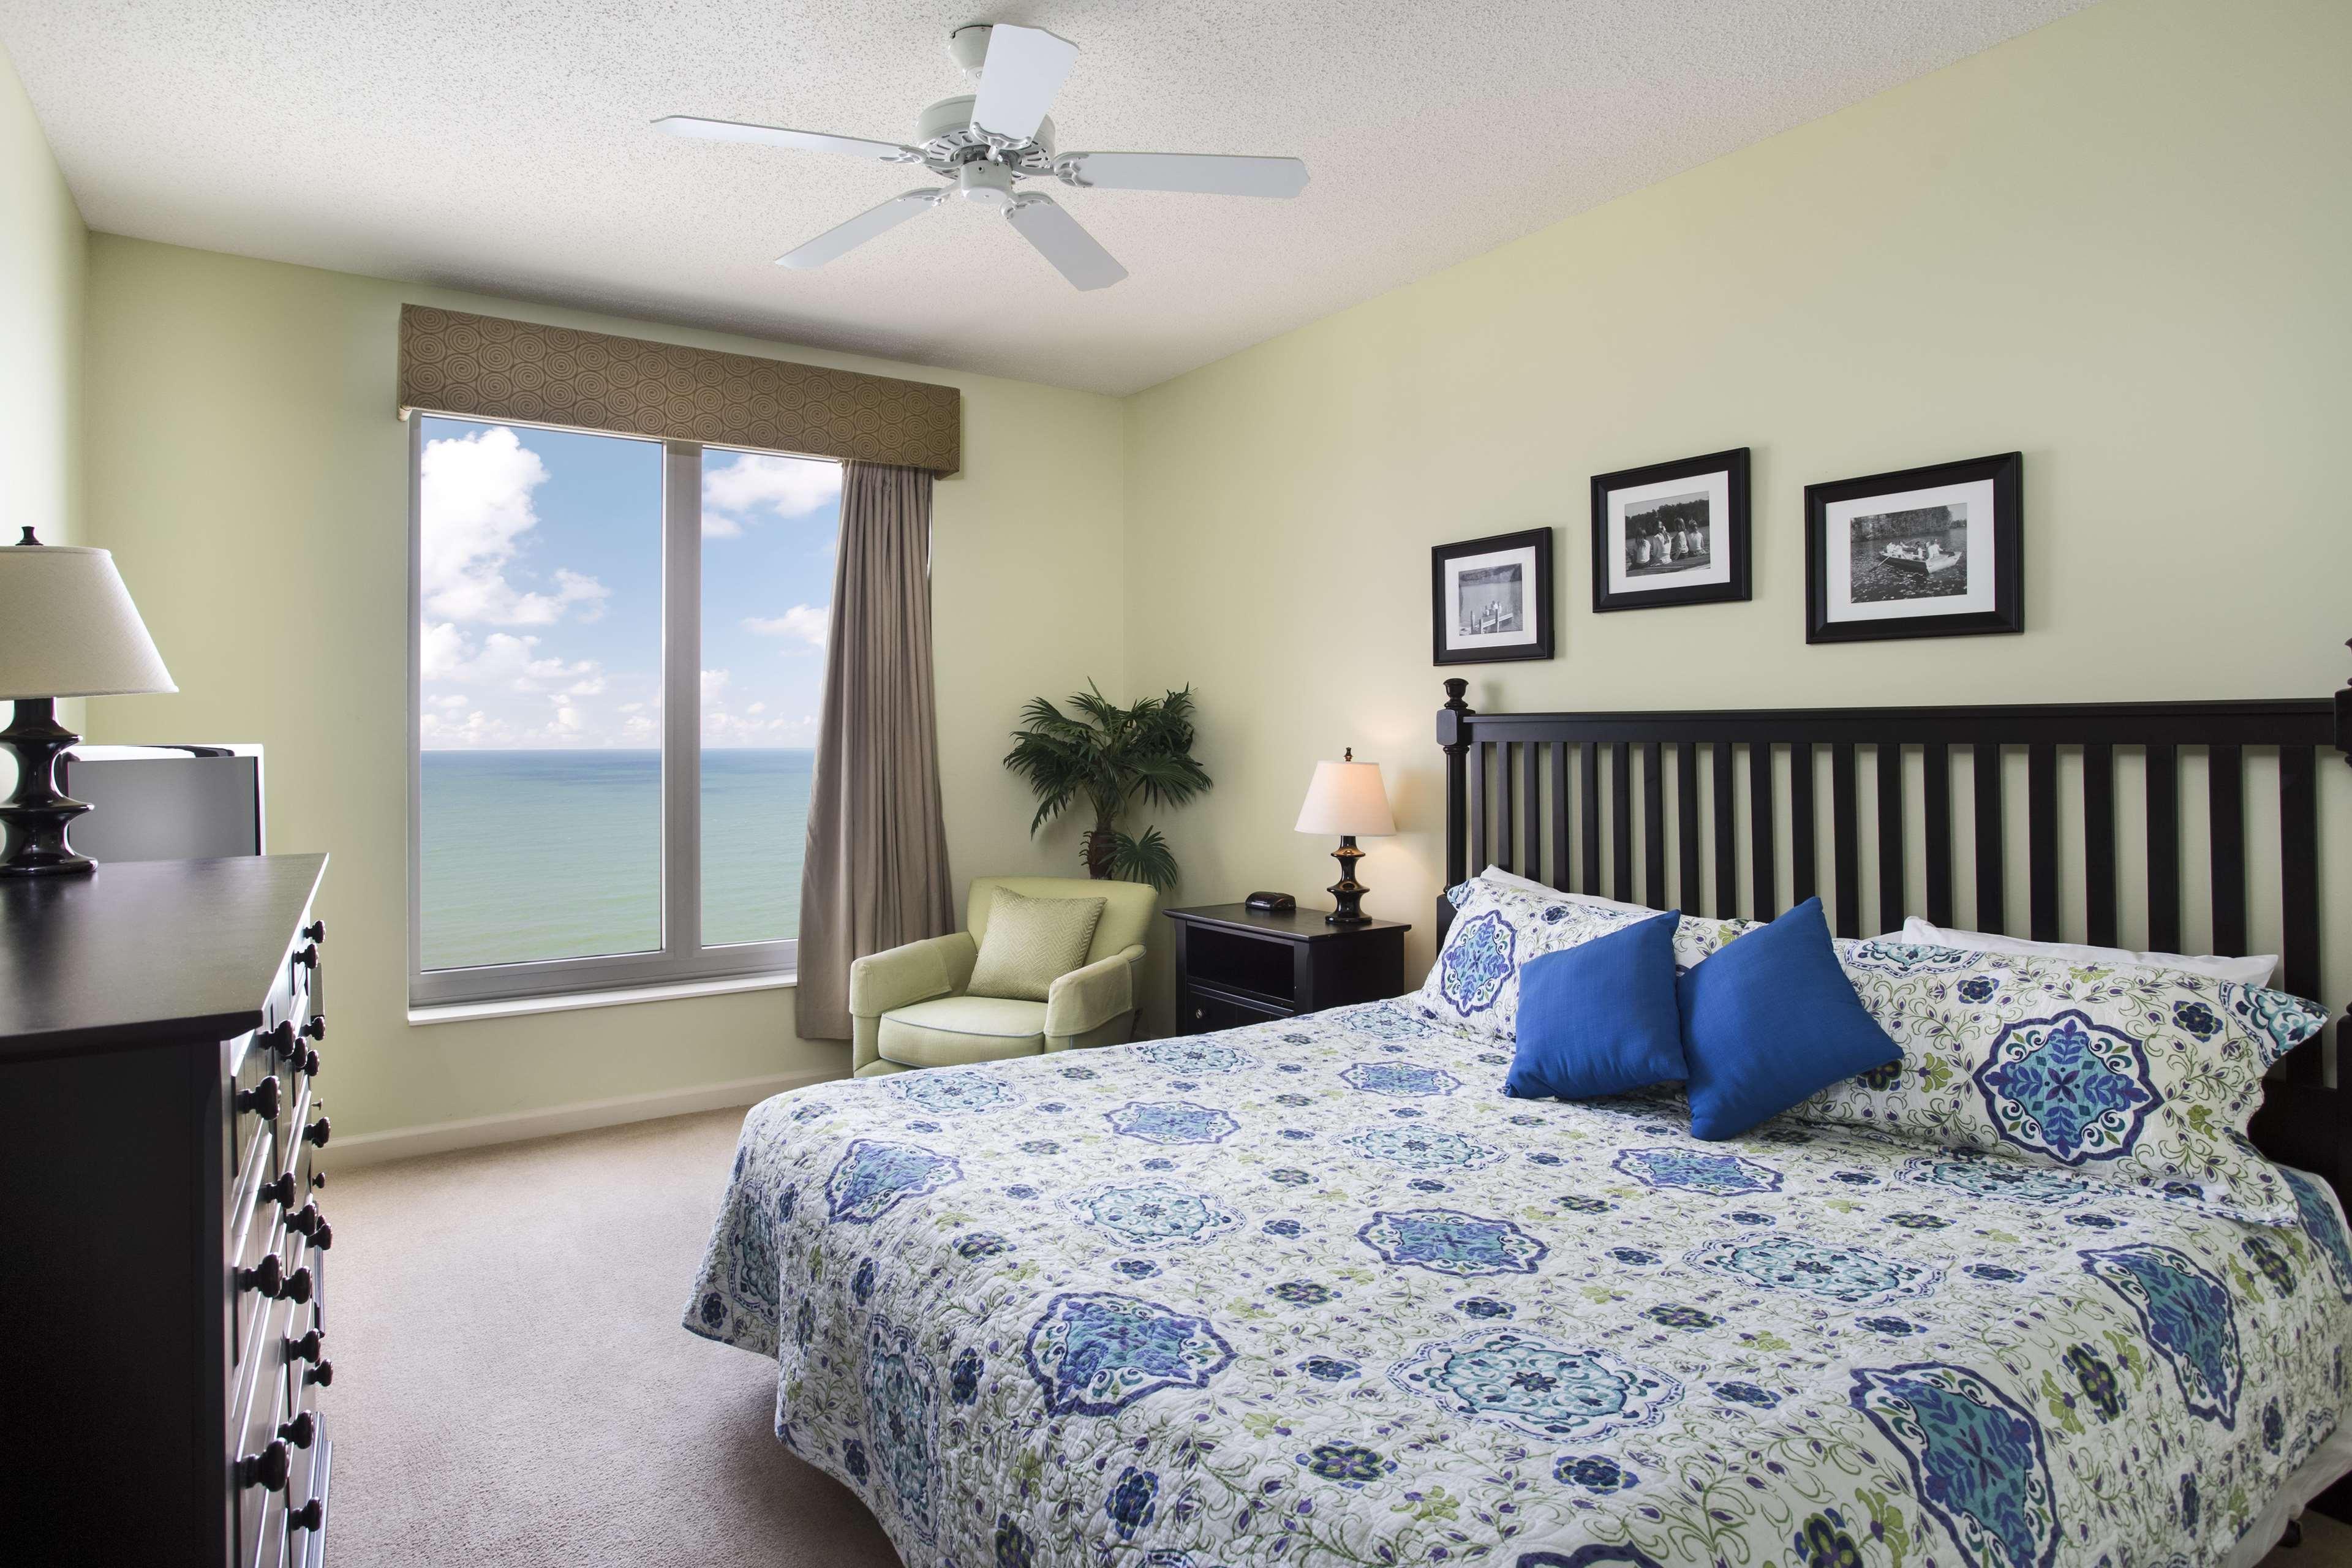 kingston plantation myrtle beach reviews - 1024×683